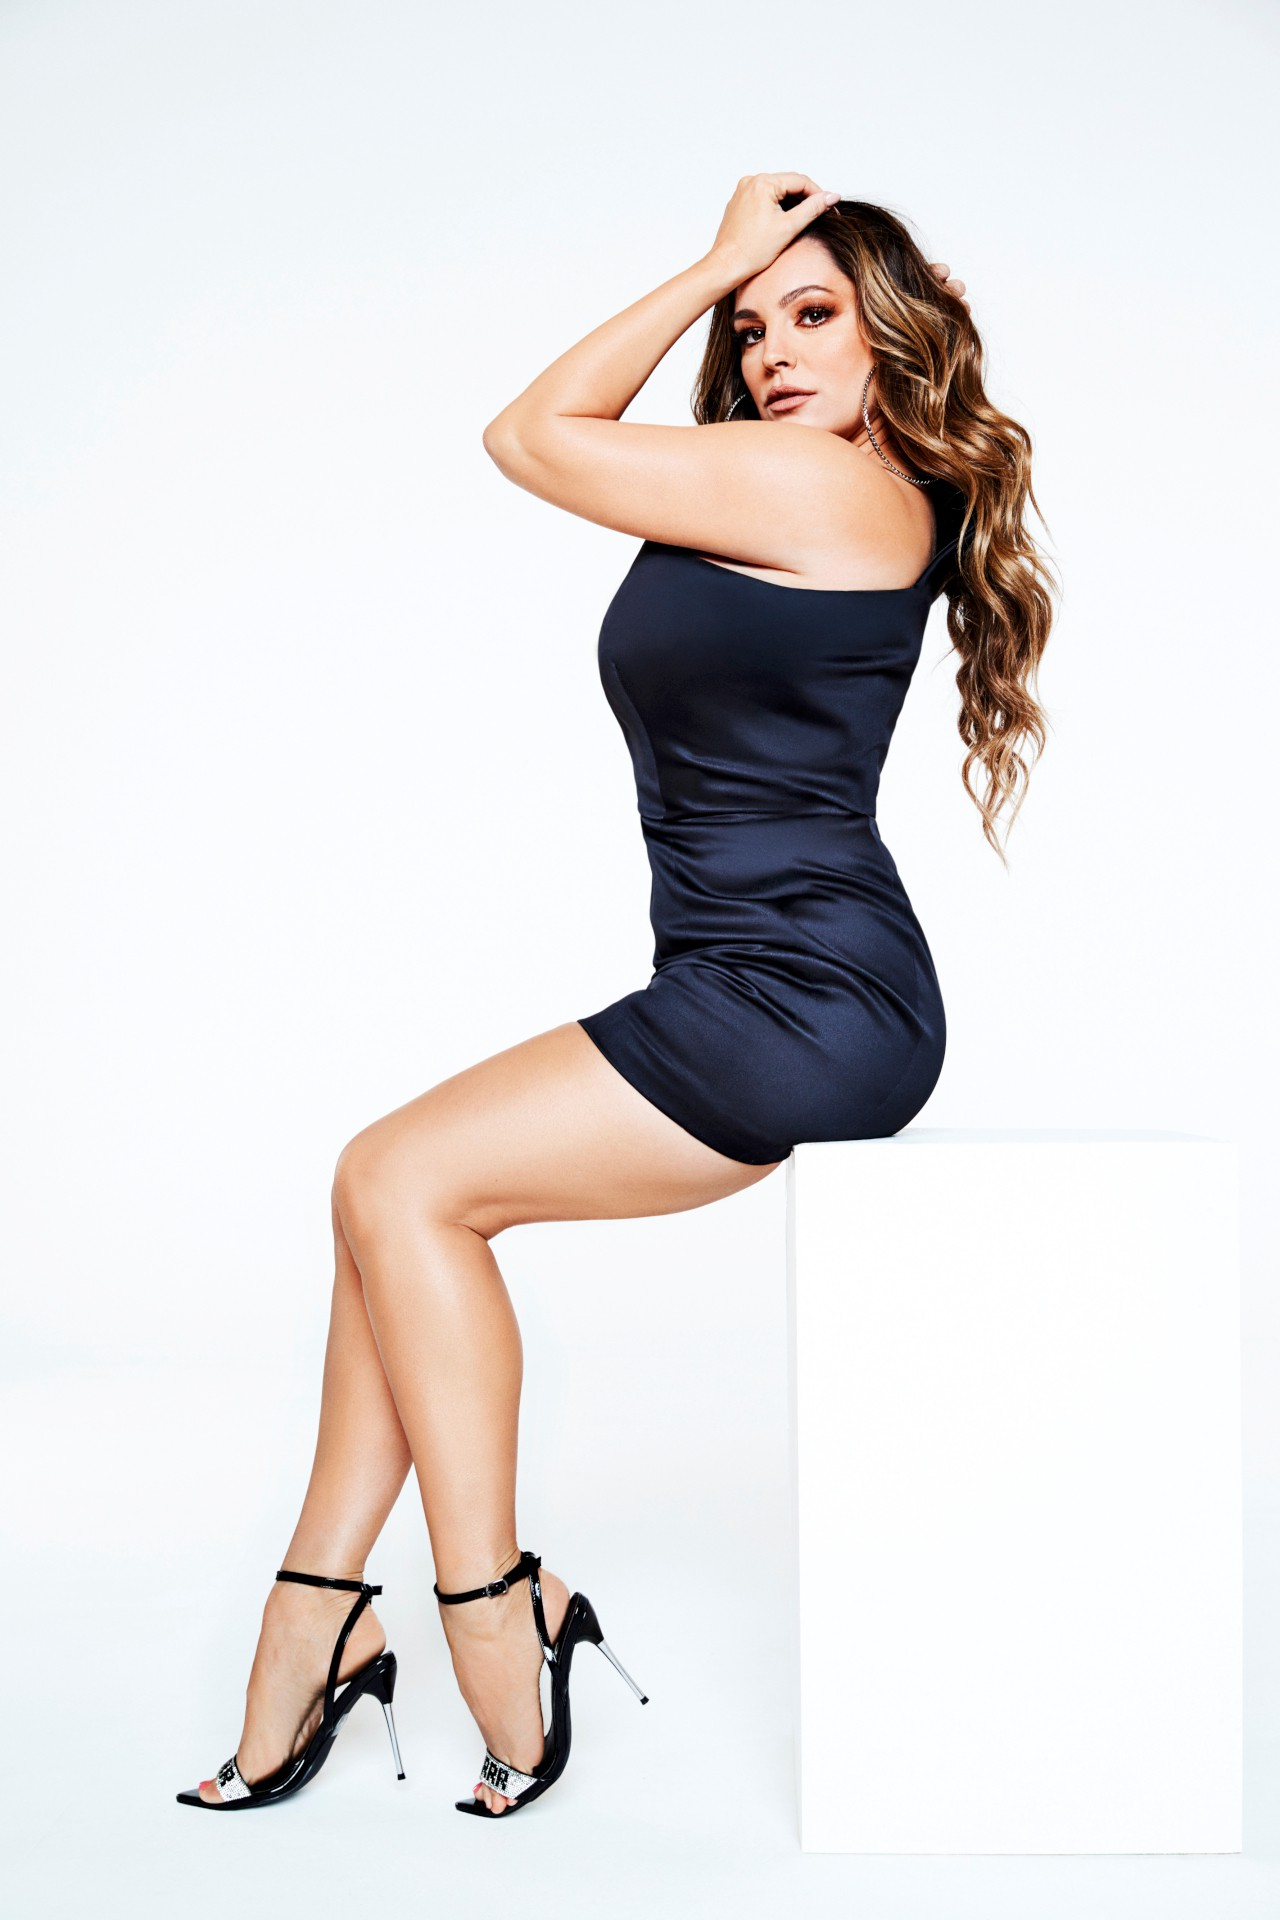 Kelly Brook Sexy Curvy Body | Hot Celebs Home